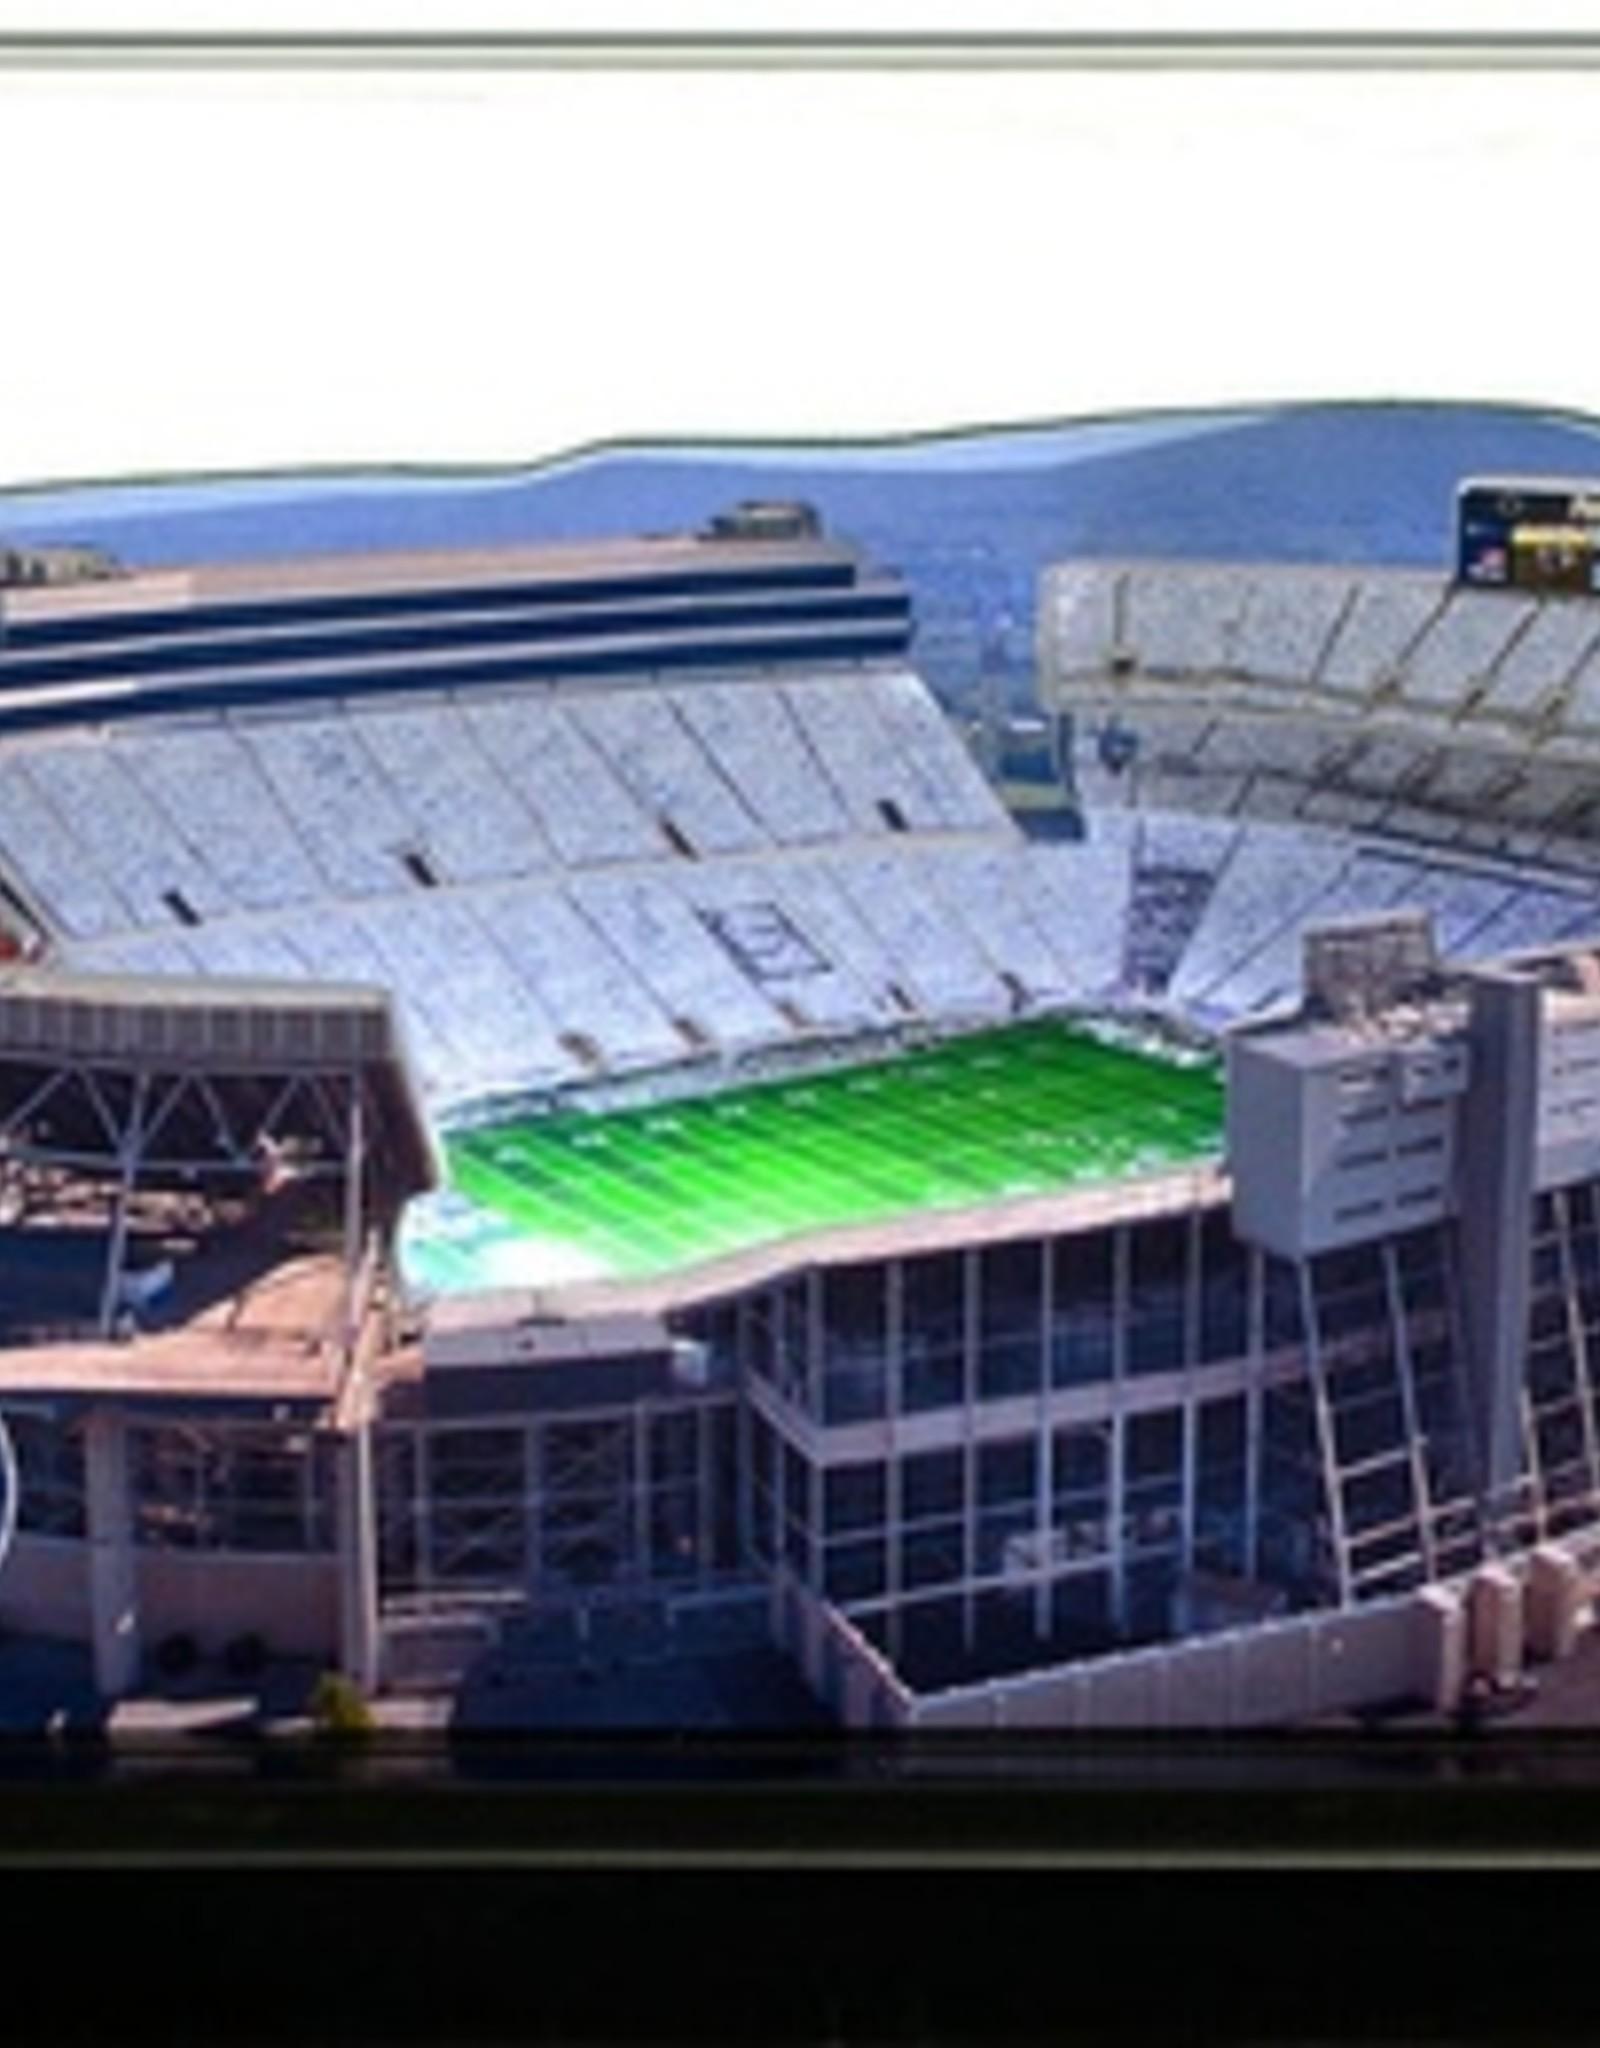 HOMEFIELDS Penn State 19IN Lighted Replica Beaver Stadium